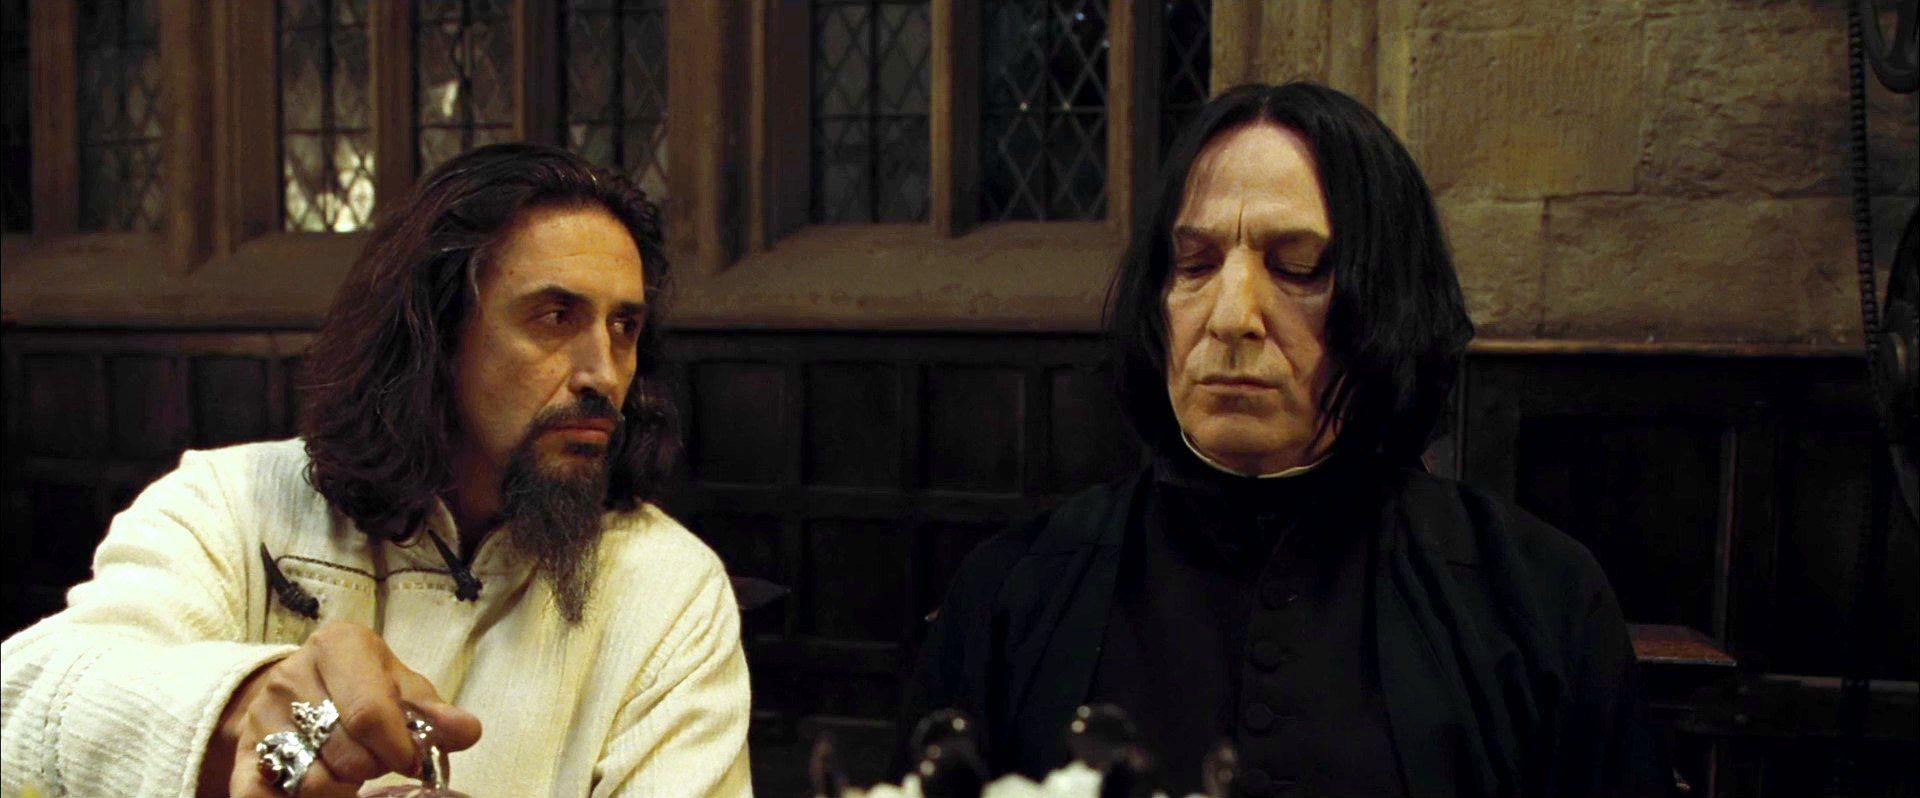 Severus Snape And Igor Karkaroff Severus Snape Harry Potter Severus Snape Snape